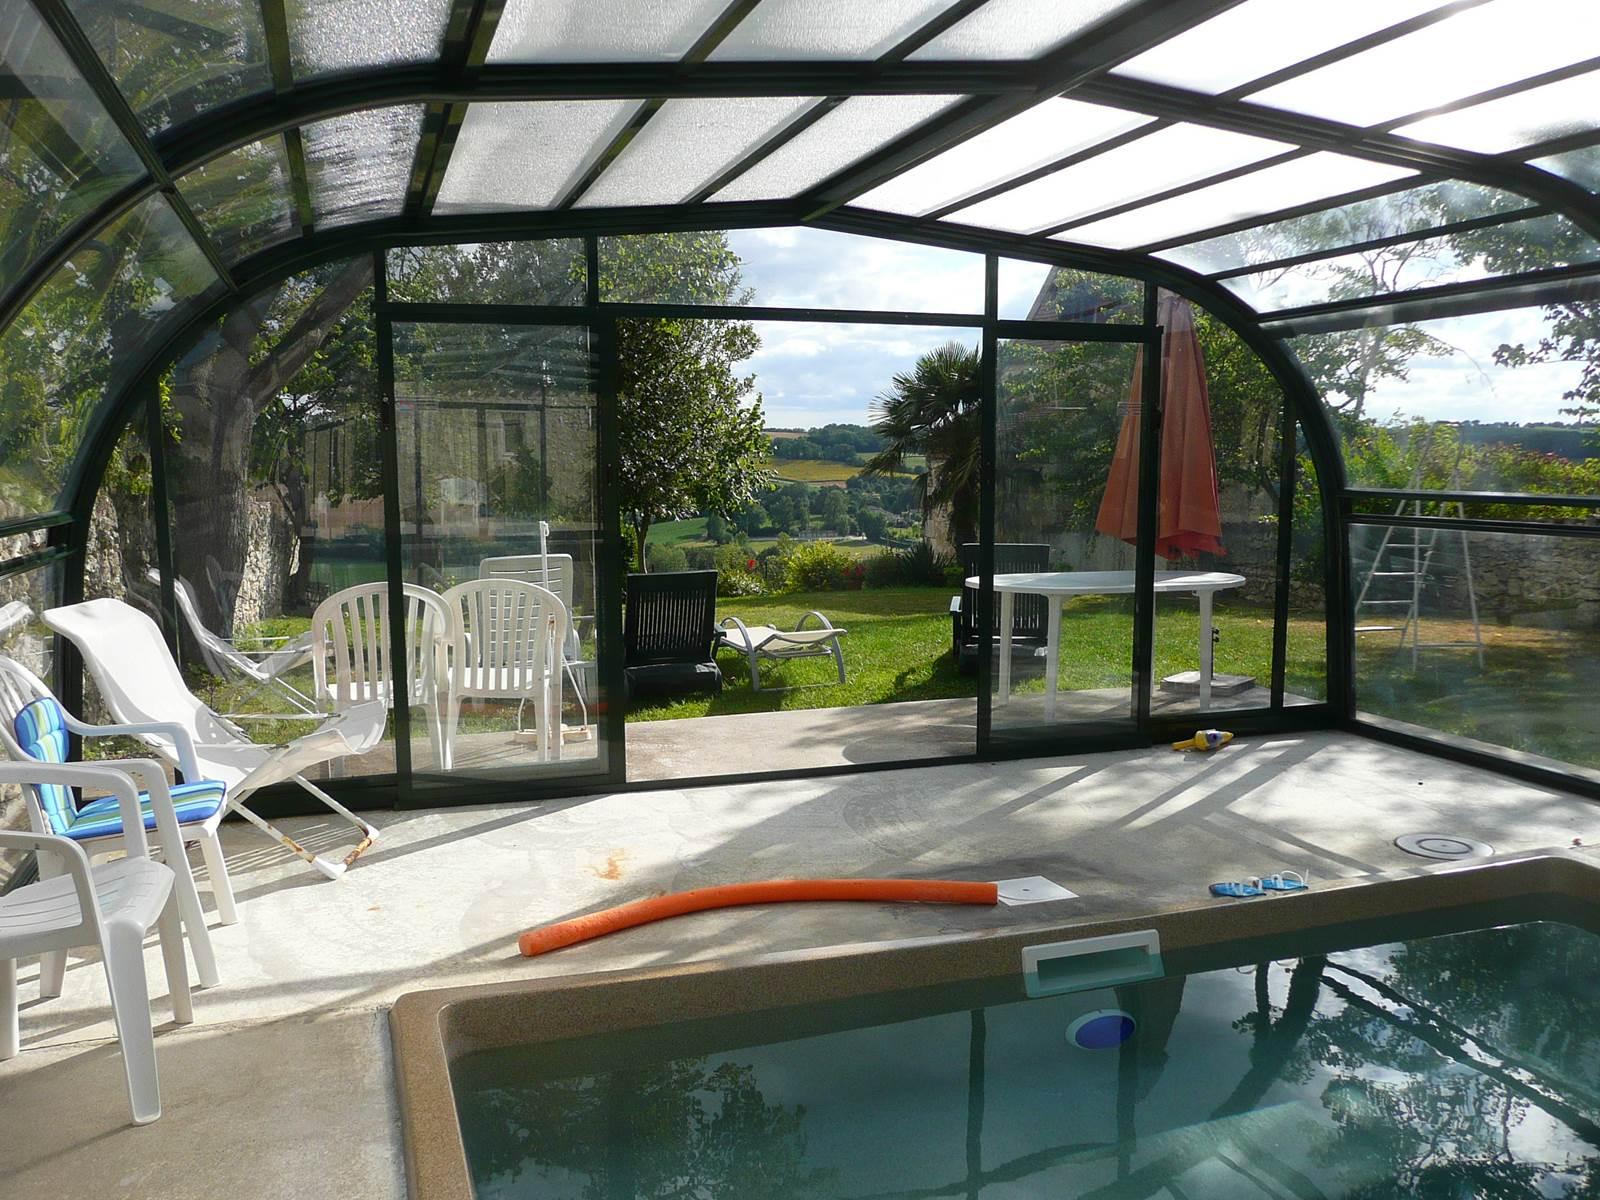 Saint Roch chambres d'hôtes piscine jardin vallée.jpg